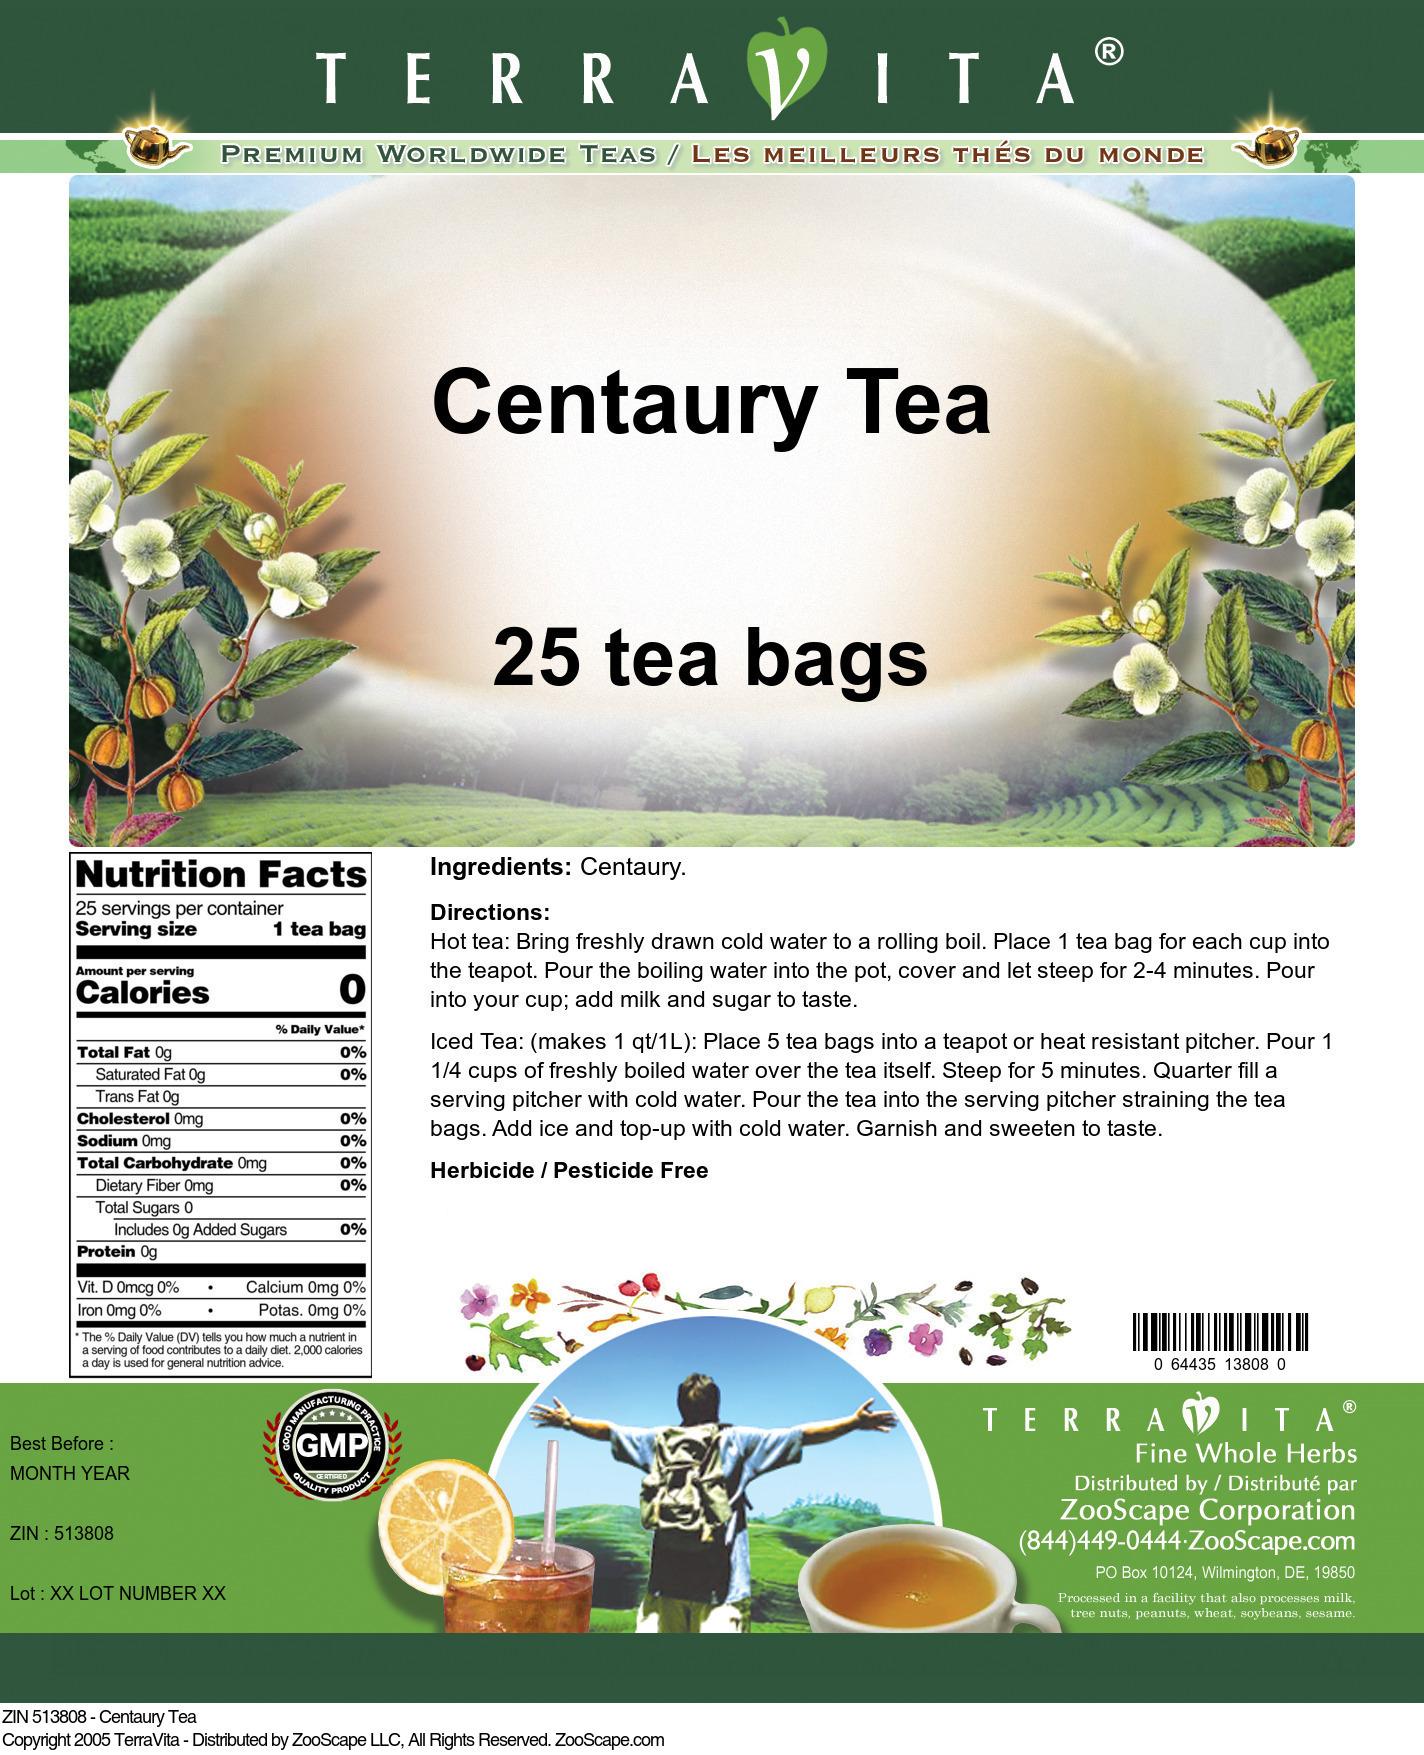 Centaury Tea